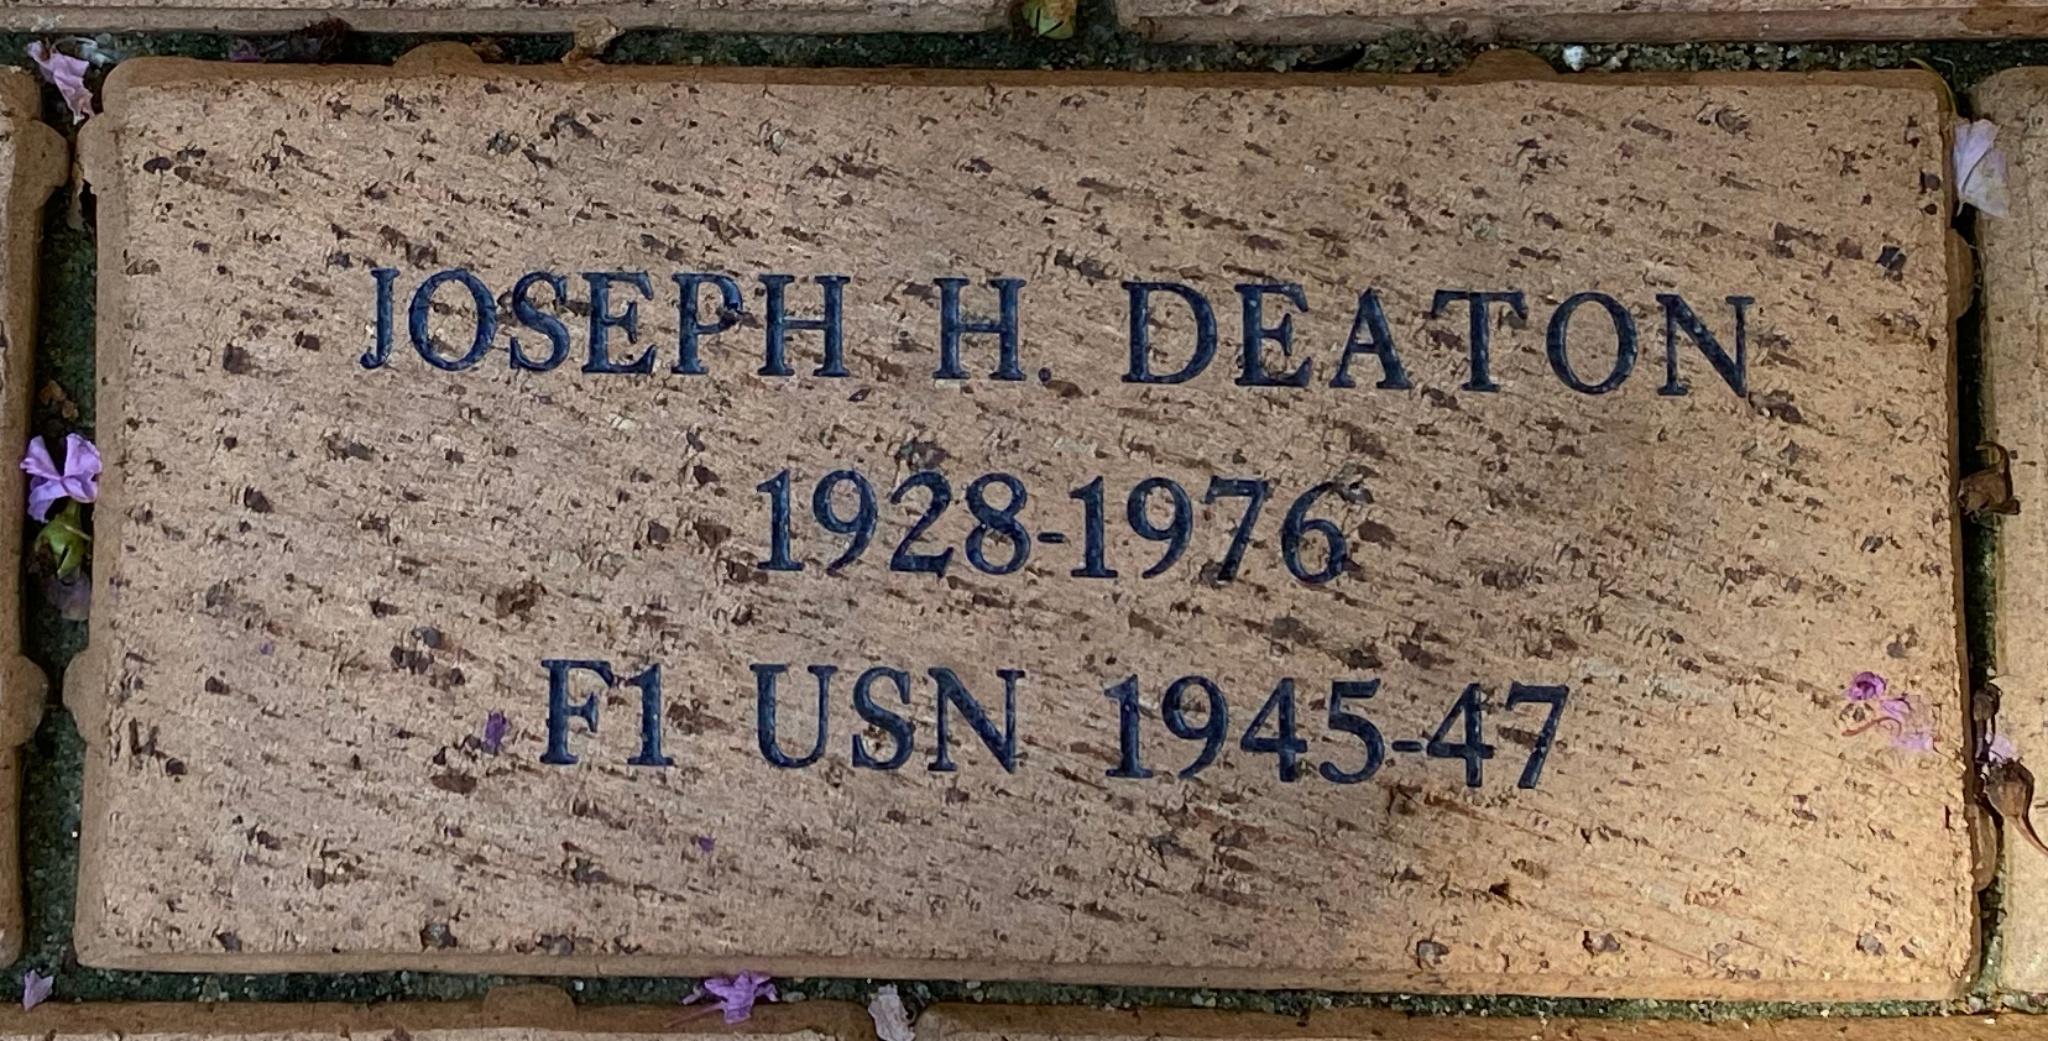 JOSEPH H DEATON 1928-1976 F1 USN 1945-47